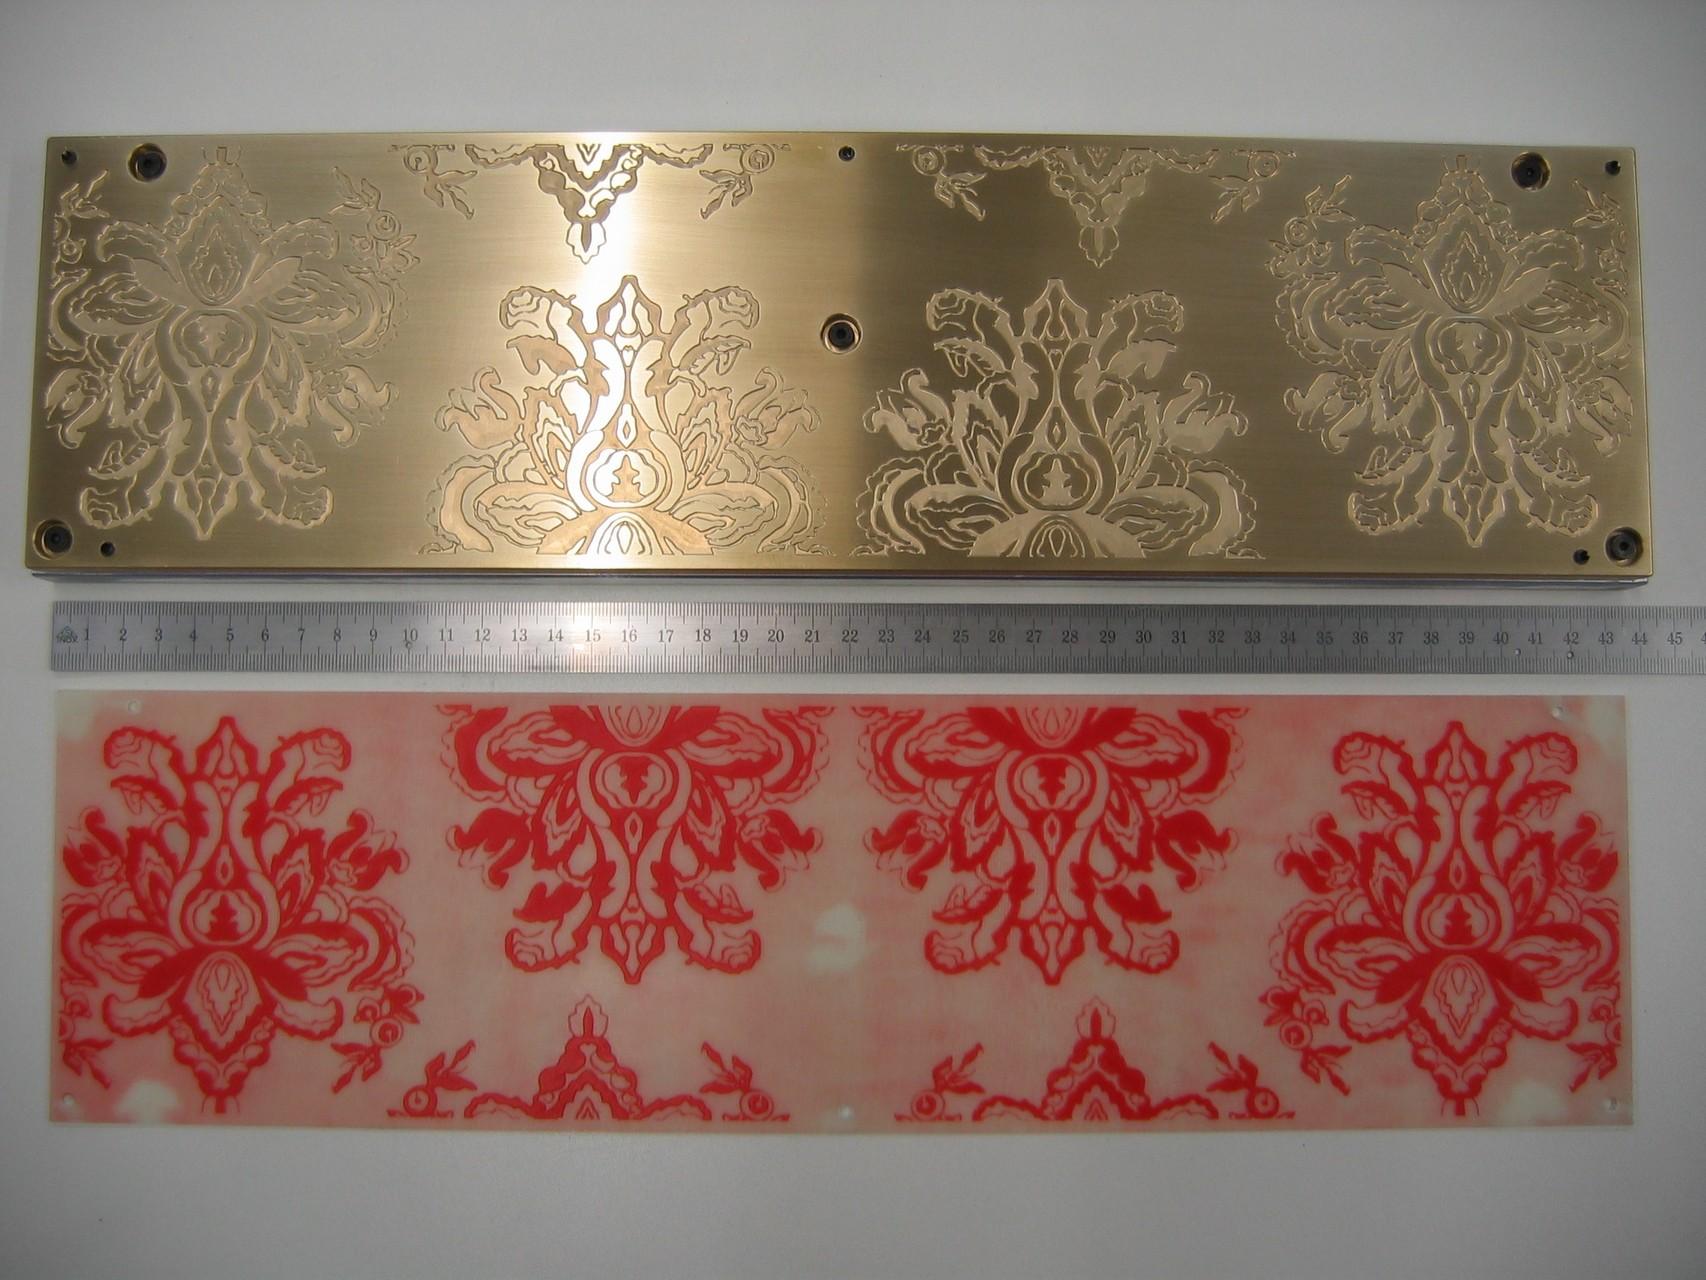 Blindprägestempel mit Aluminium-Fundament und Gießpatrize